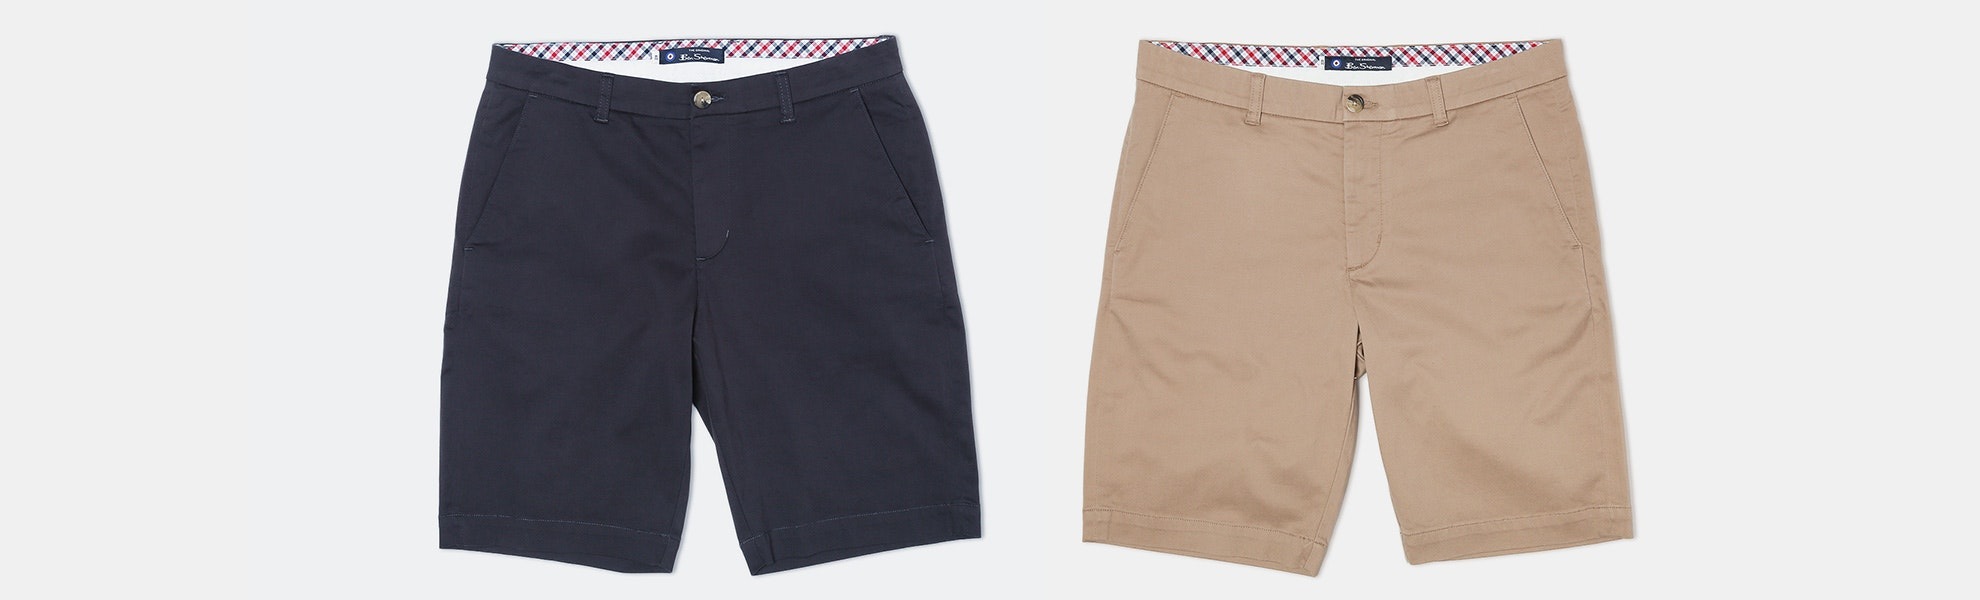 Ben Sherman Stretch Sueded Sateen Shorts